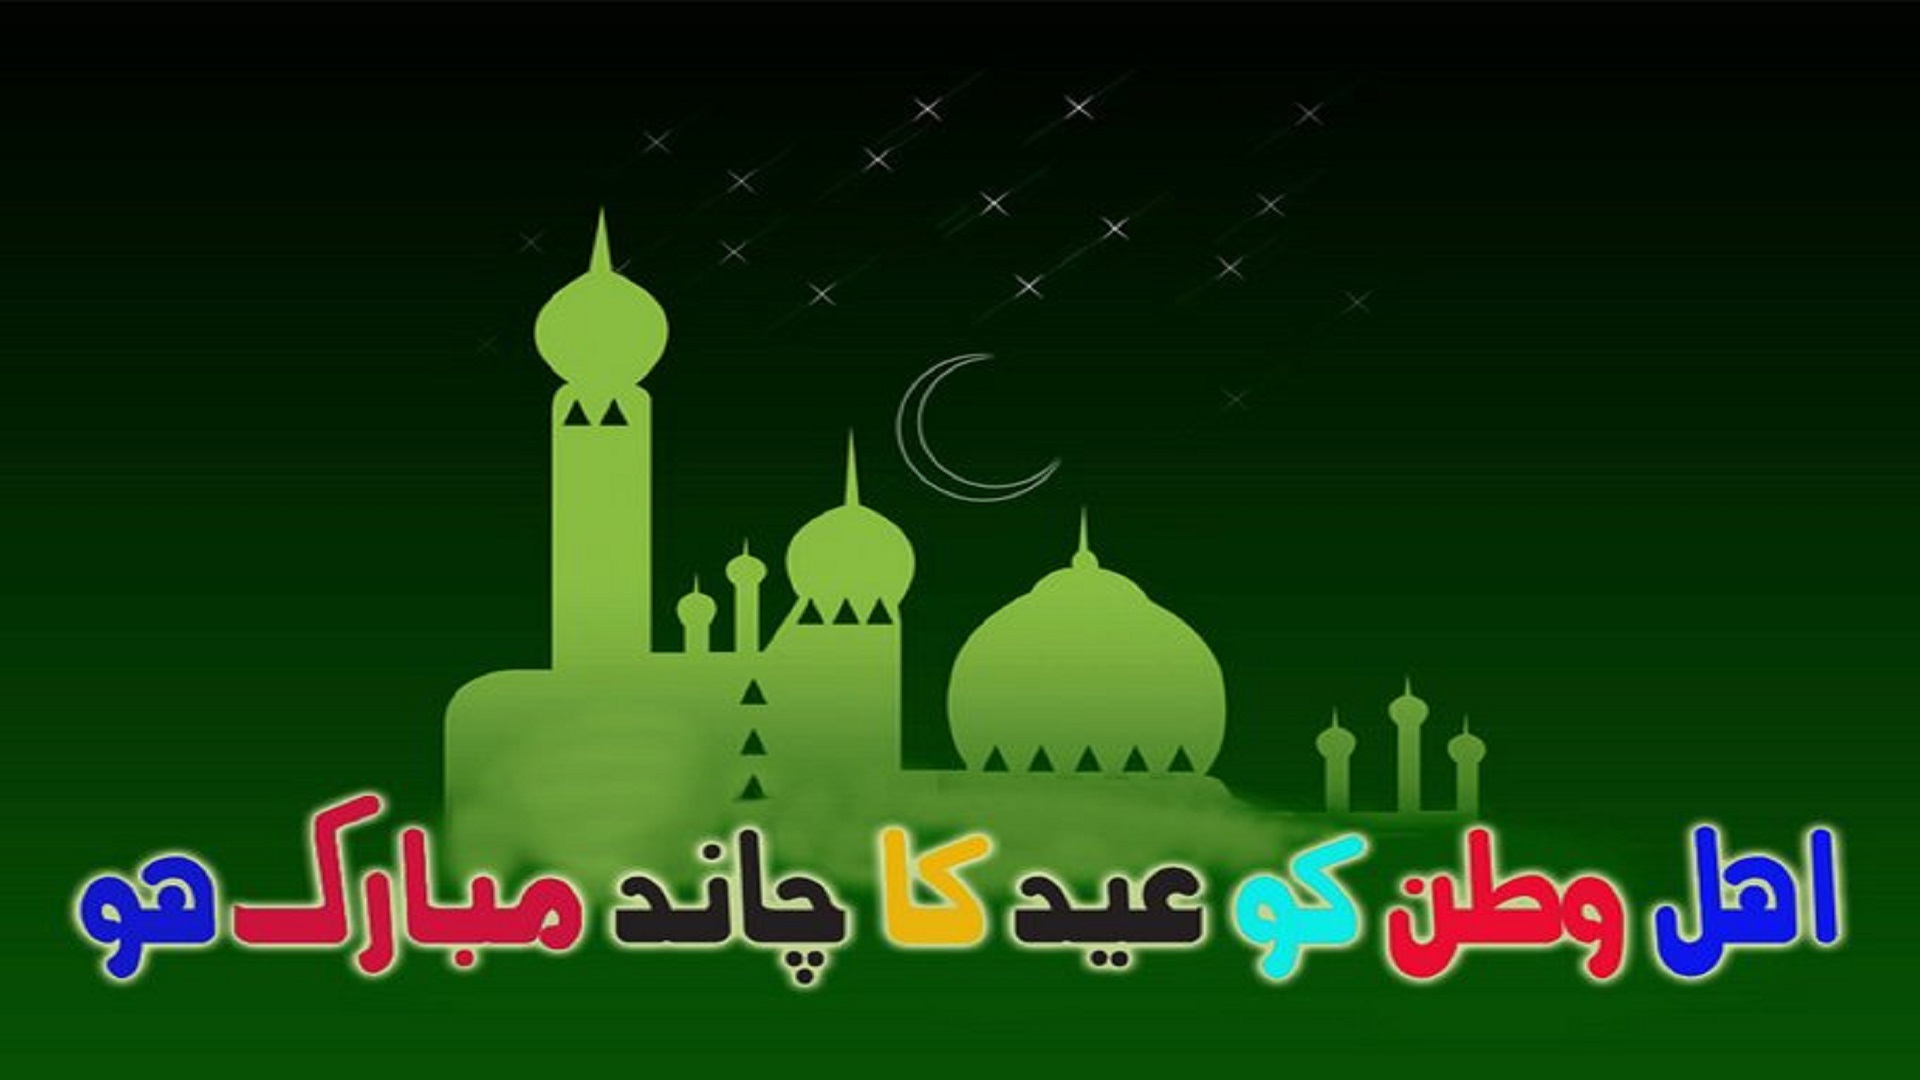 chand-raat-mubarak-facebook-free-hd-wallpapers